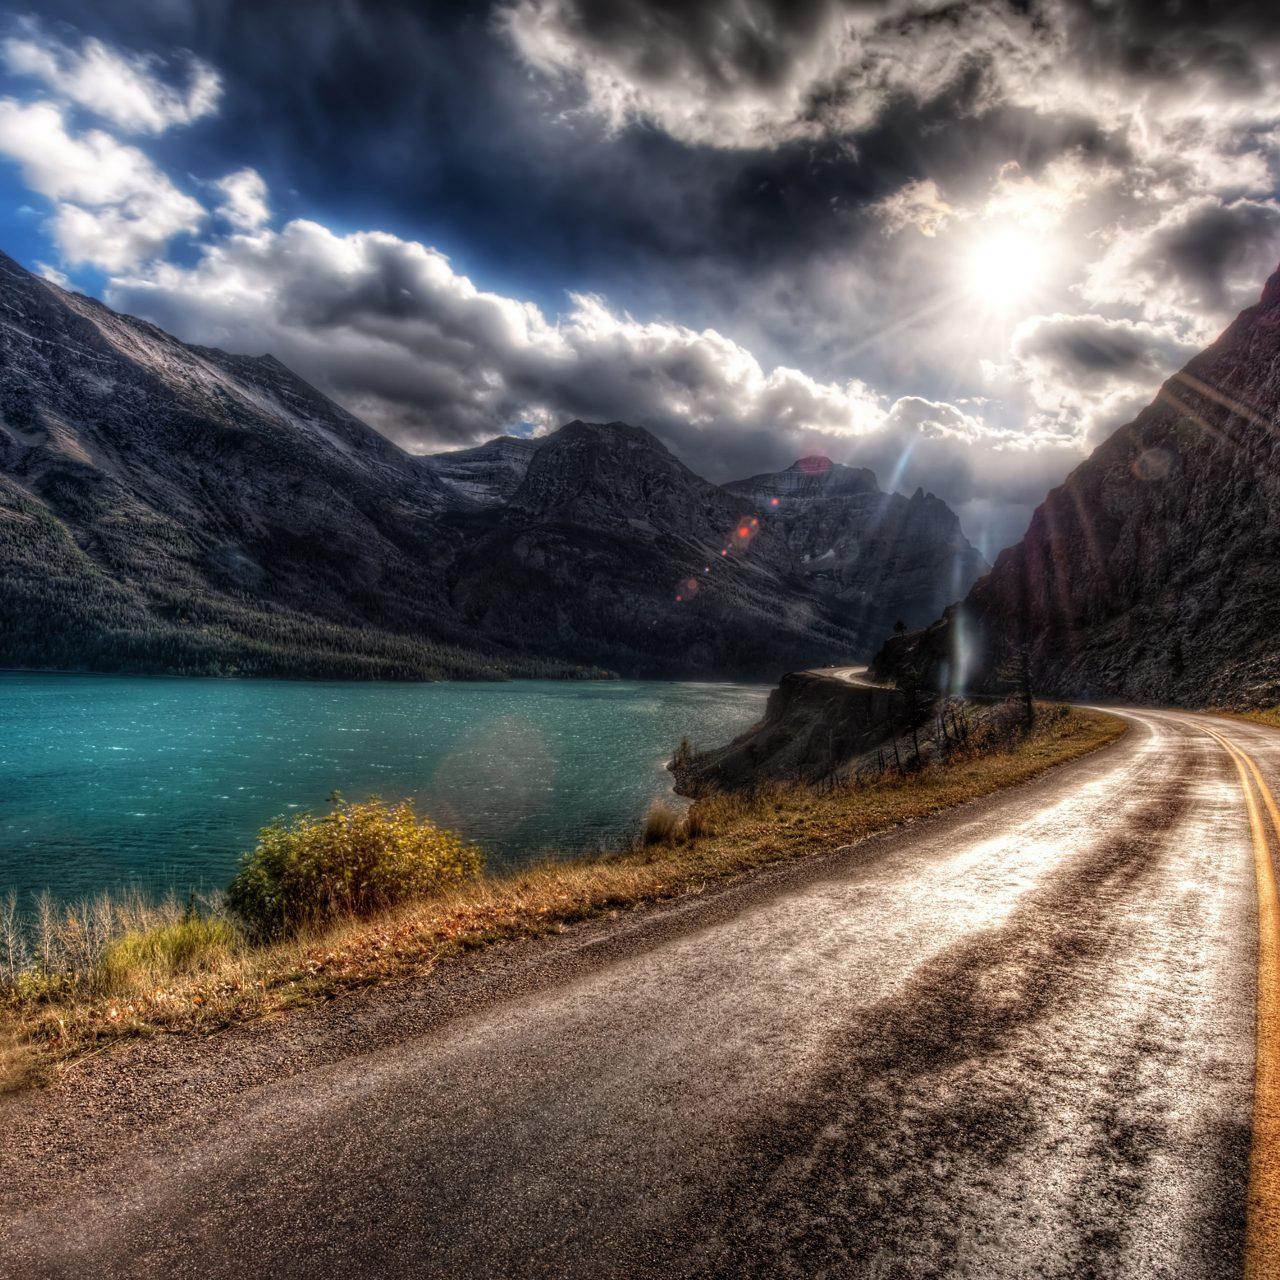 Smartphone Wallpaper 4k Nature: Road Path Way Mountain Nature Water 4K Wallpaper